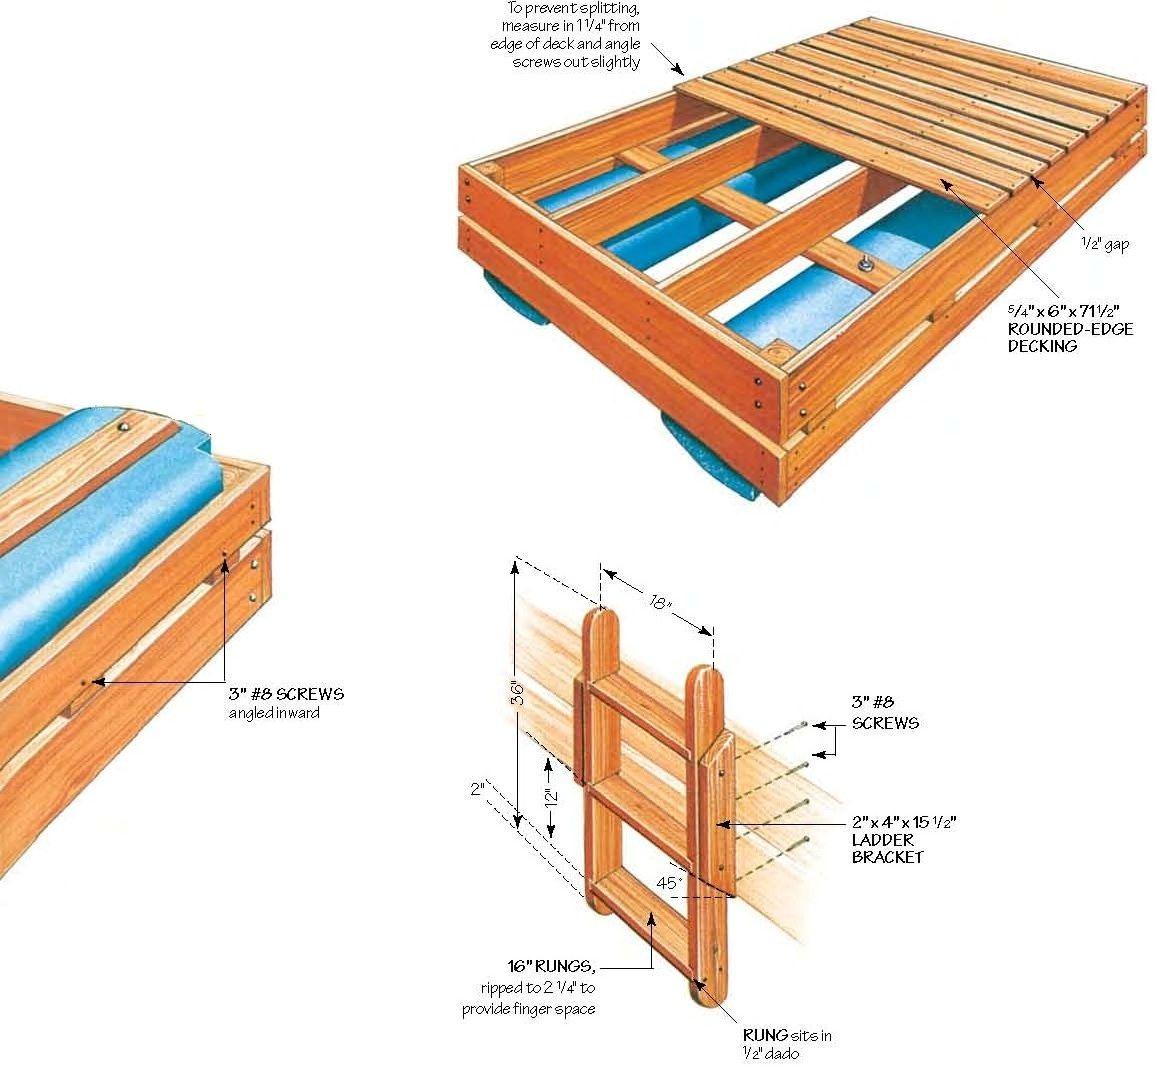 Free Swim Raft Wood Plans Diy In 2019 Floating Picnic